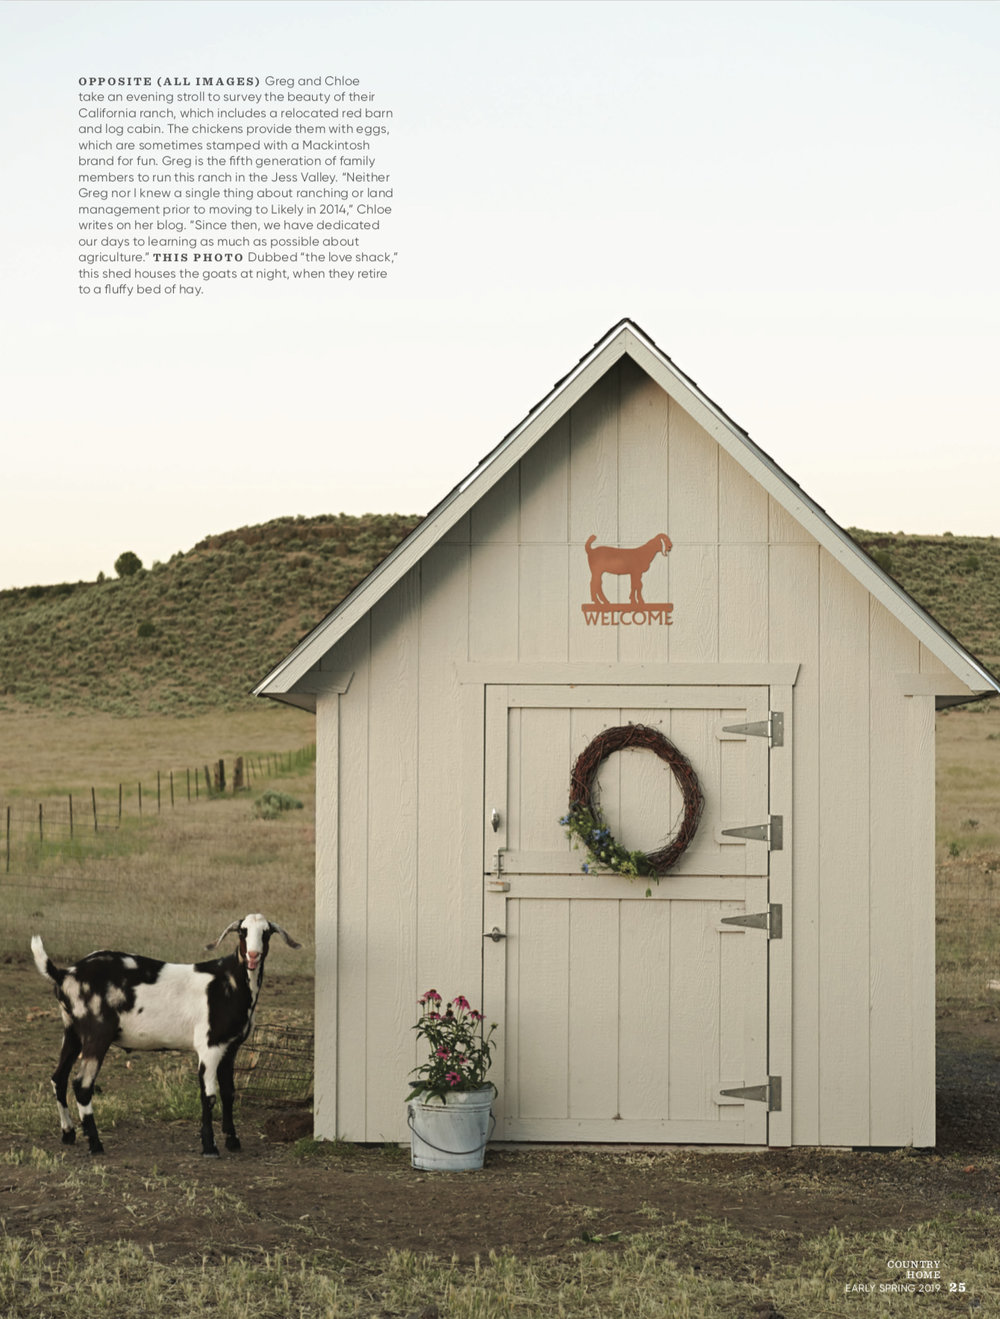 White+goat+barn+with+nubian+goat+|+storage+shed+barn+ideas+|+#farmhousestyle+#goats copy.jpg